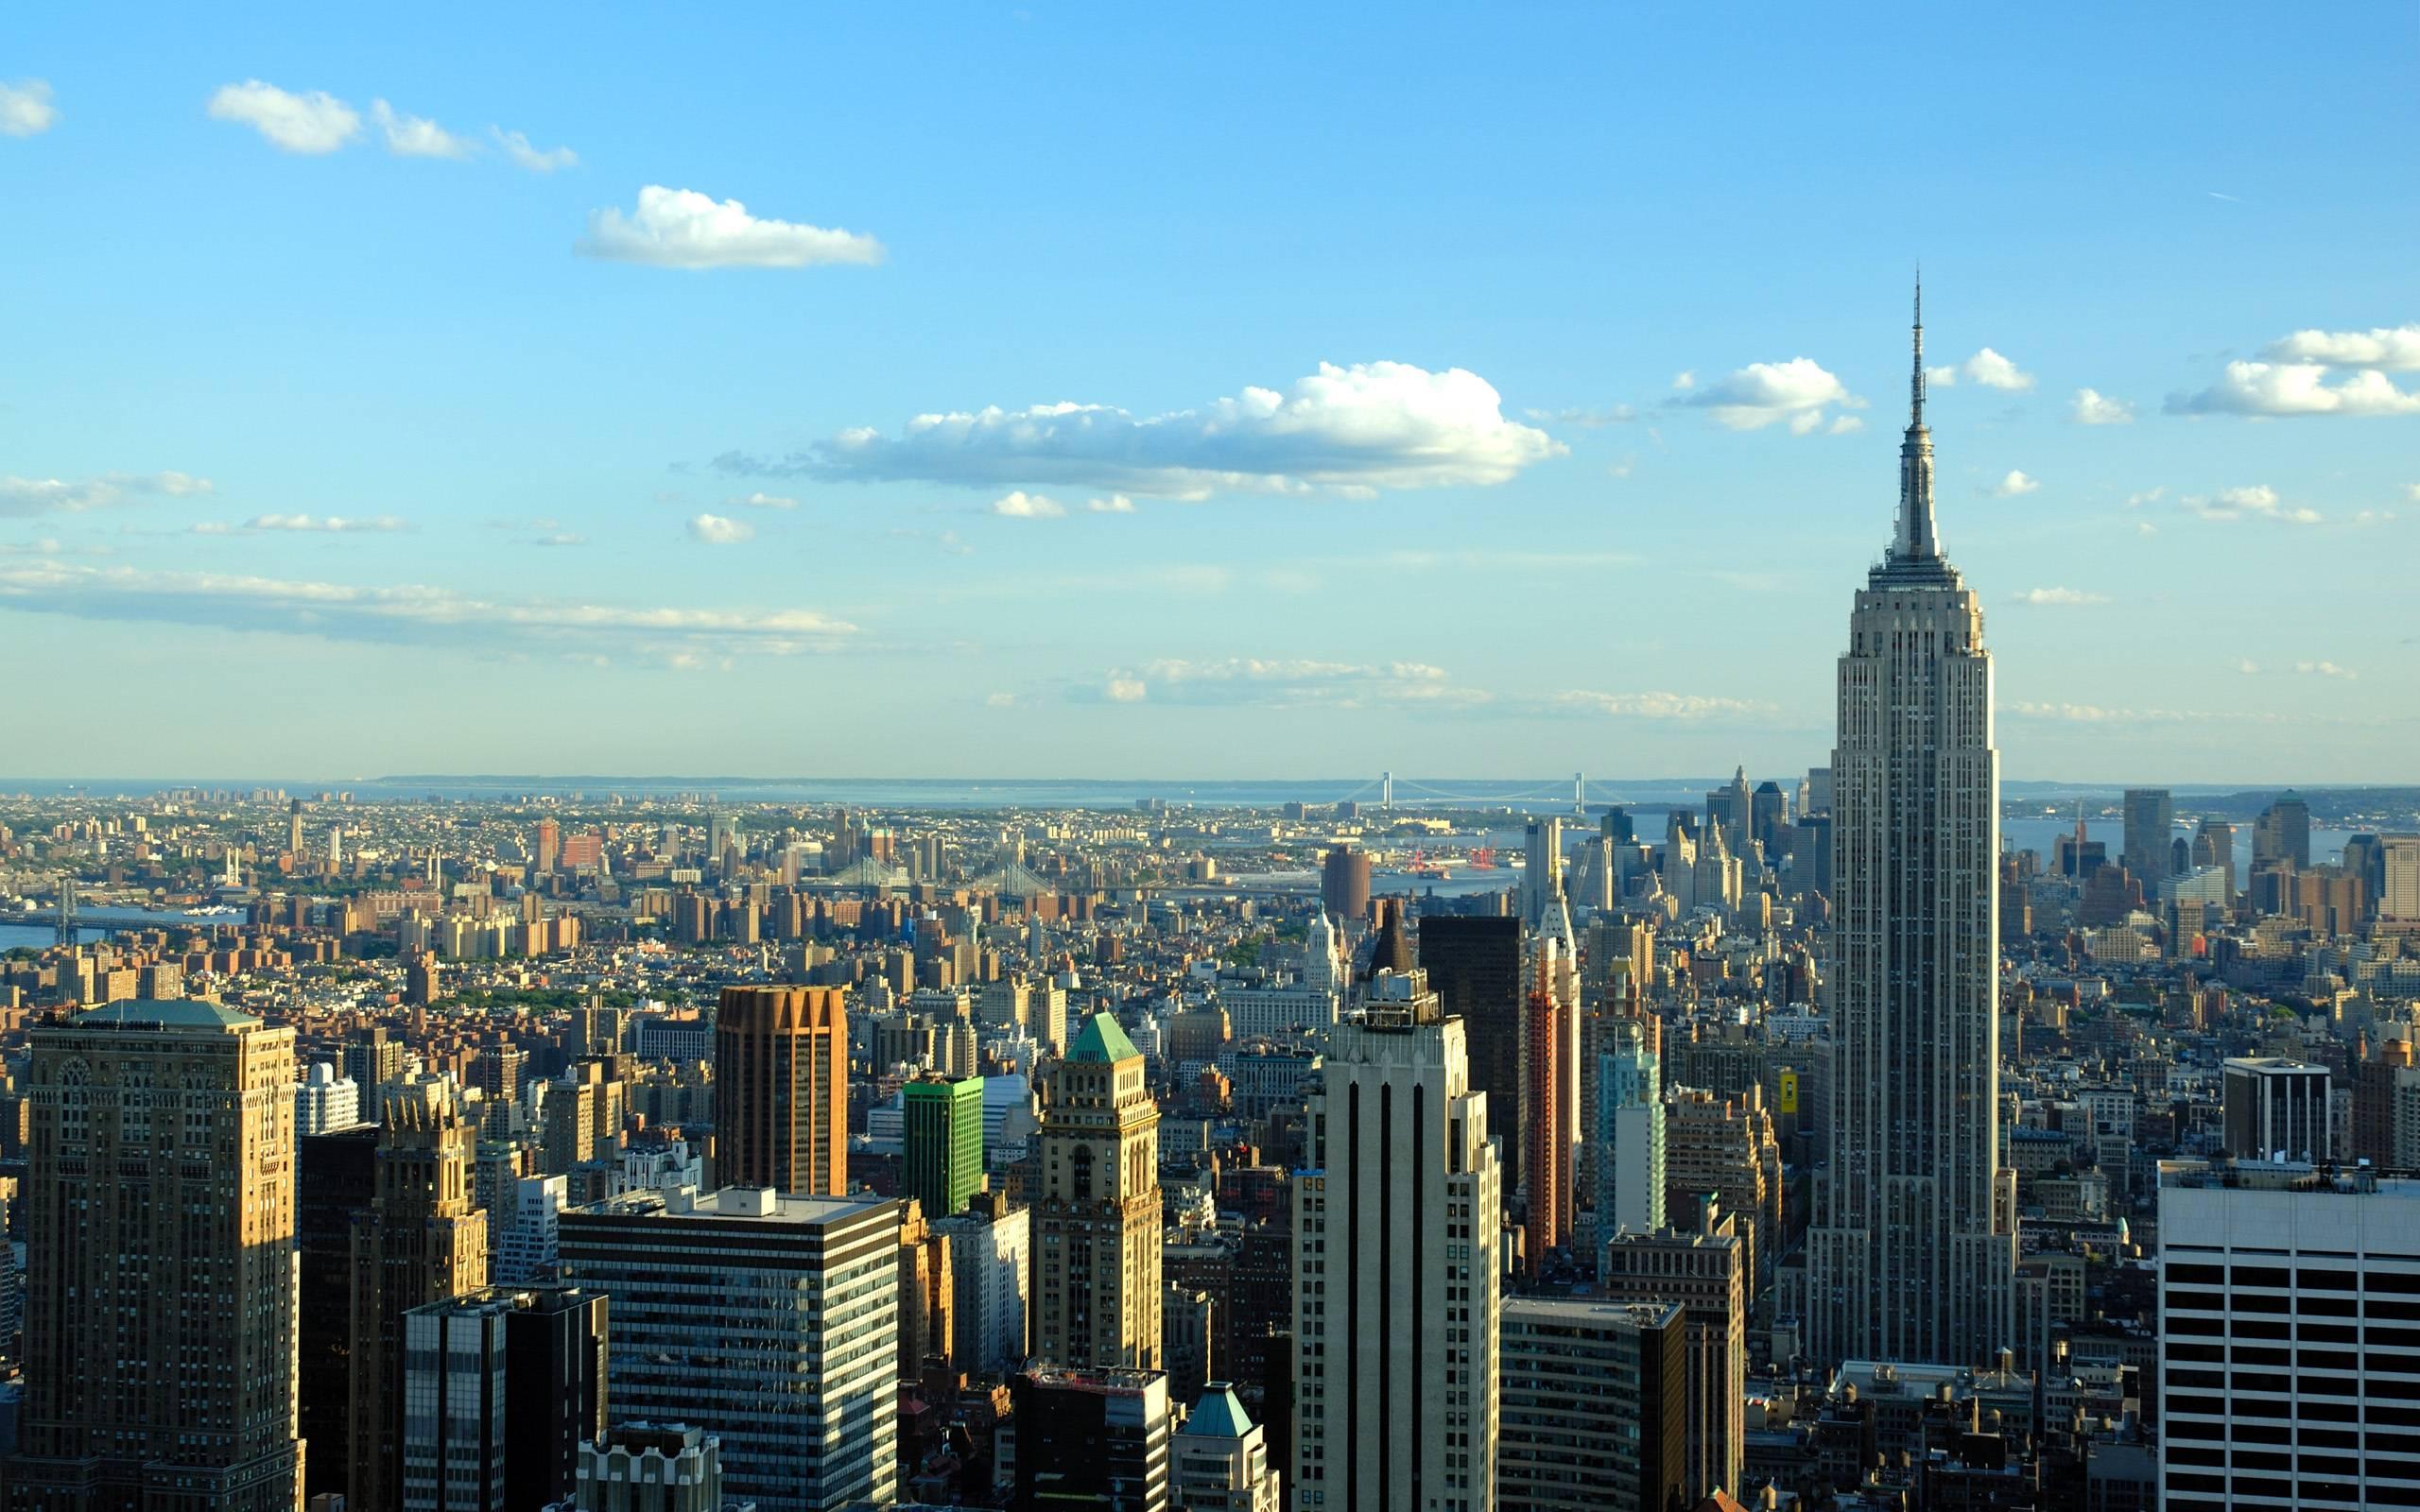 New York Desktop Backgrounds 2560x1600